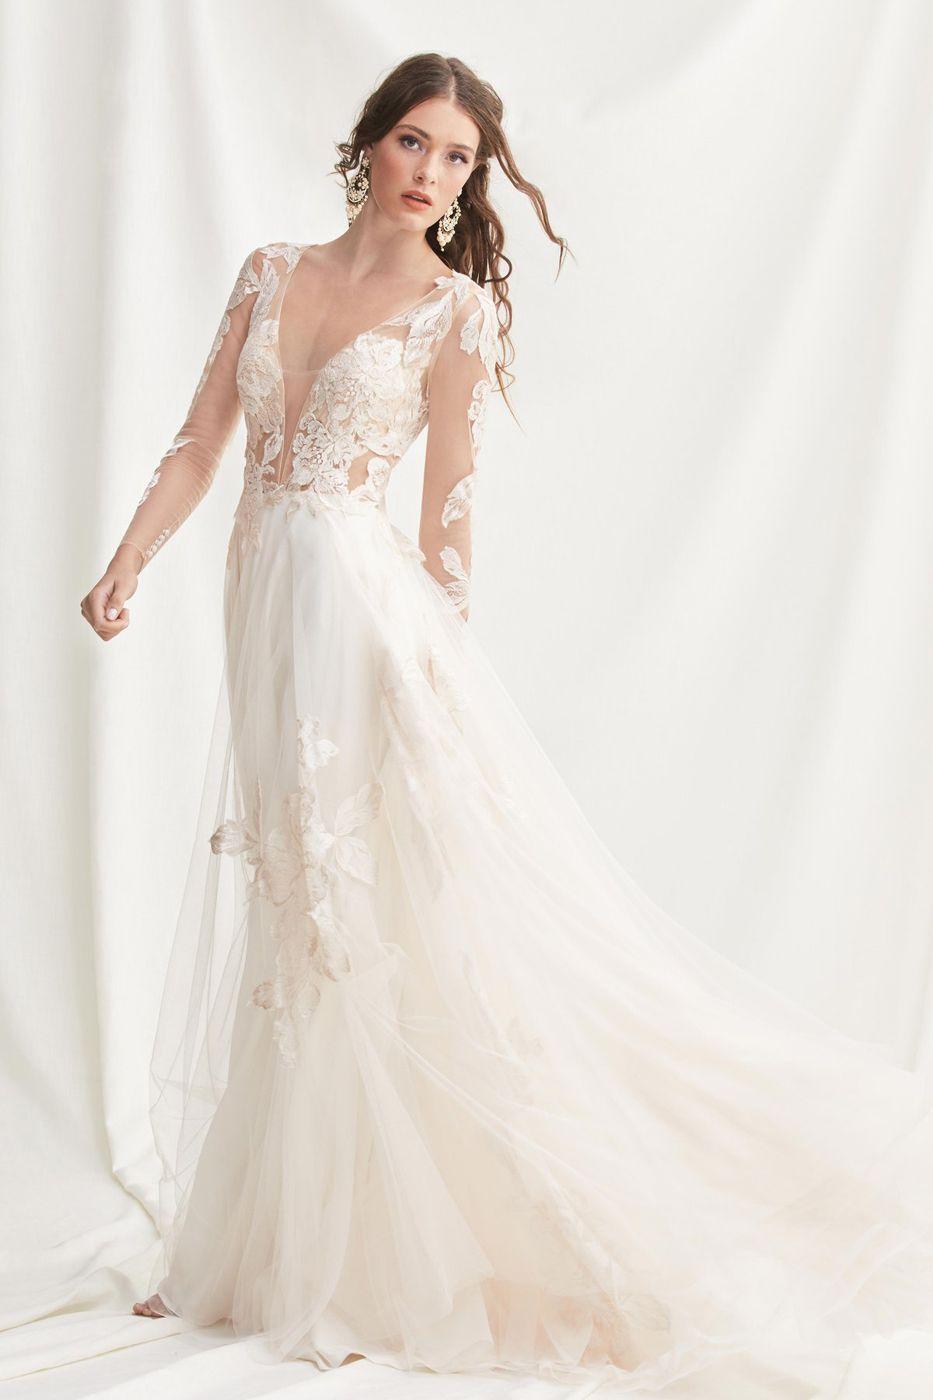 Willowby 52700 Rhapsody Long Sleeve Wedding Dress In 2021 Wedding Dress Long Sleeve Long Sleeve Wedding Gowns Wedding Dresses [ 1400 x 933 Pixel ]